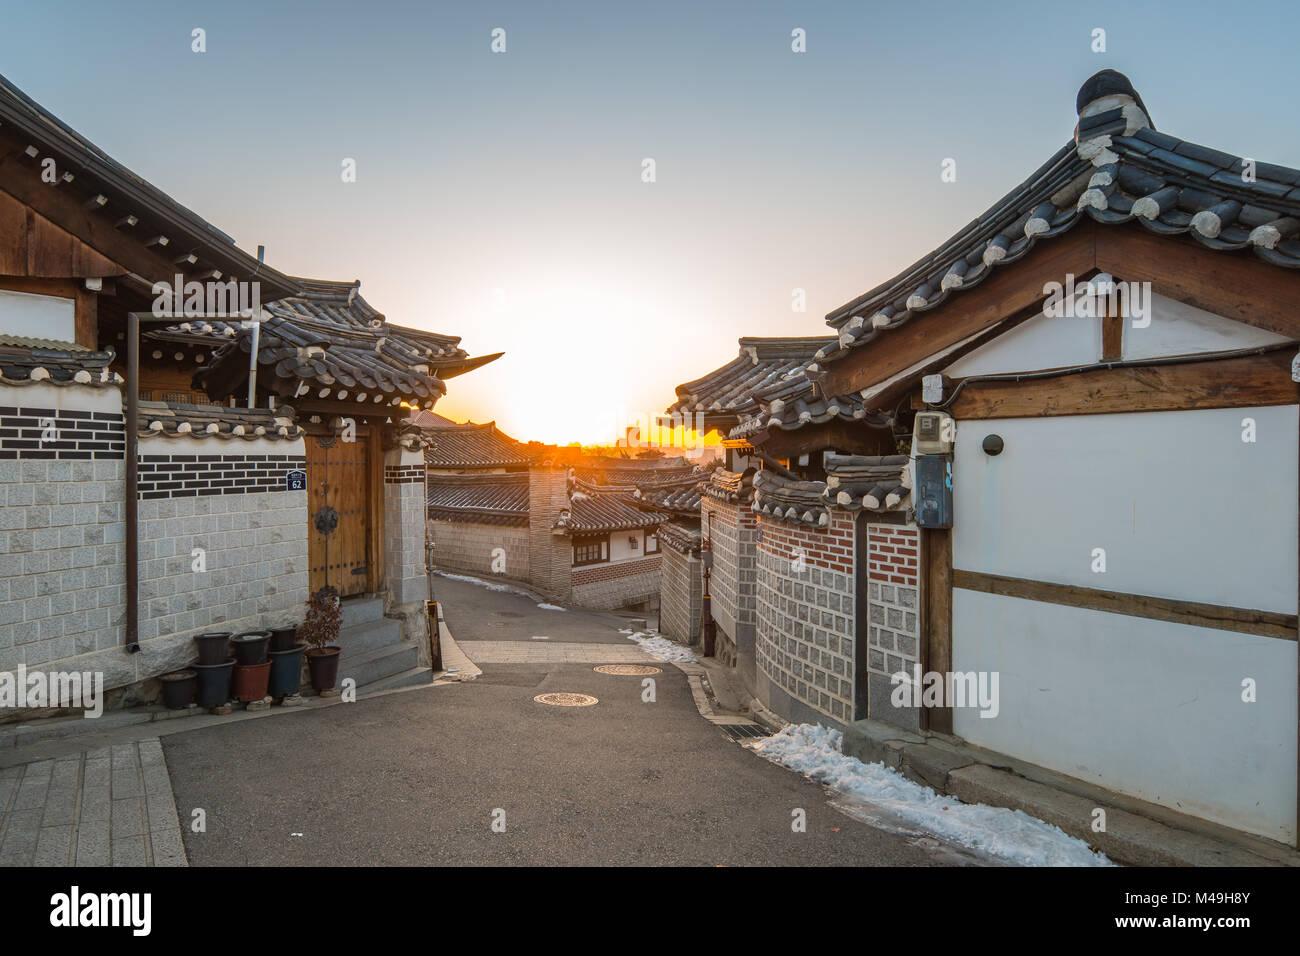 Sonnenaufgang am Morgen mit Blick auf das Dorf Bukchon Hanok in Seoul, Korea. Stockbild